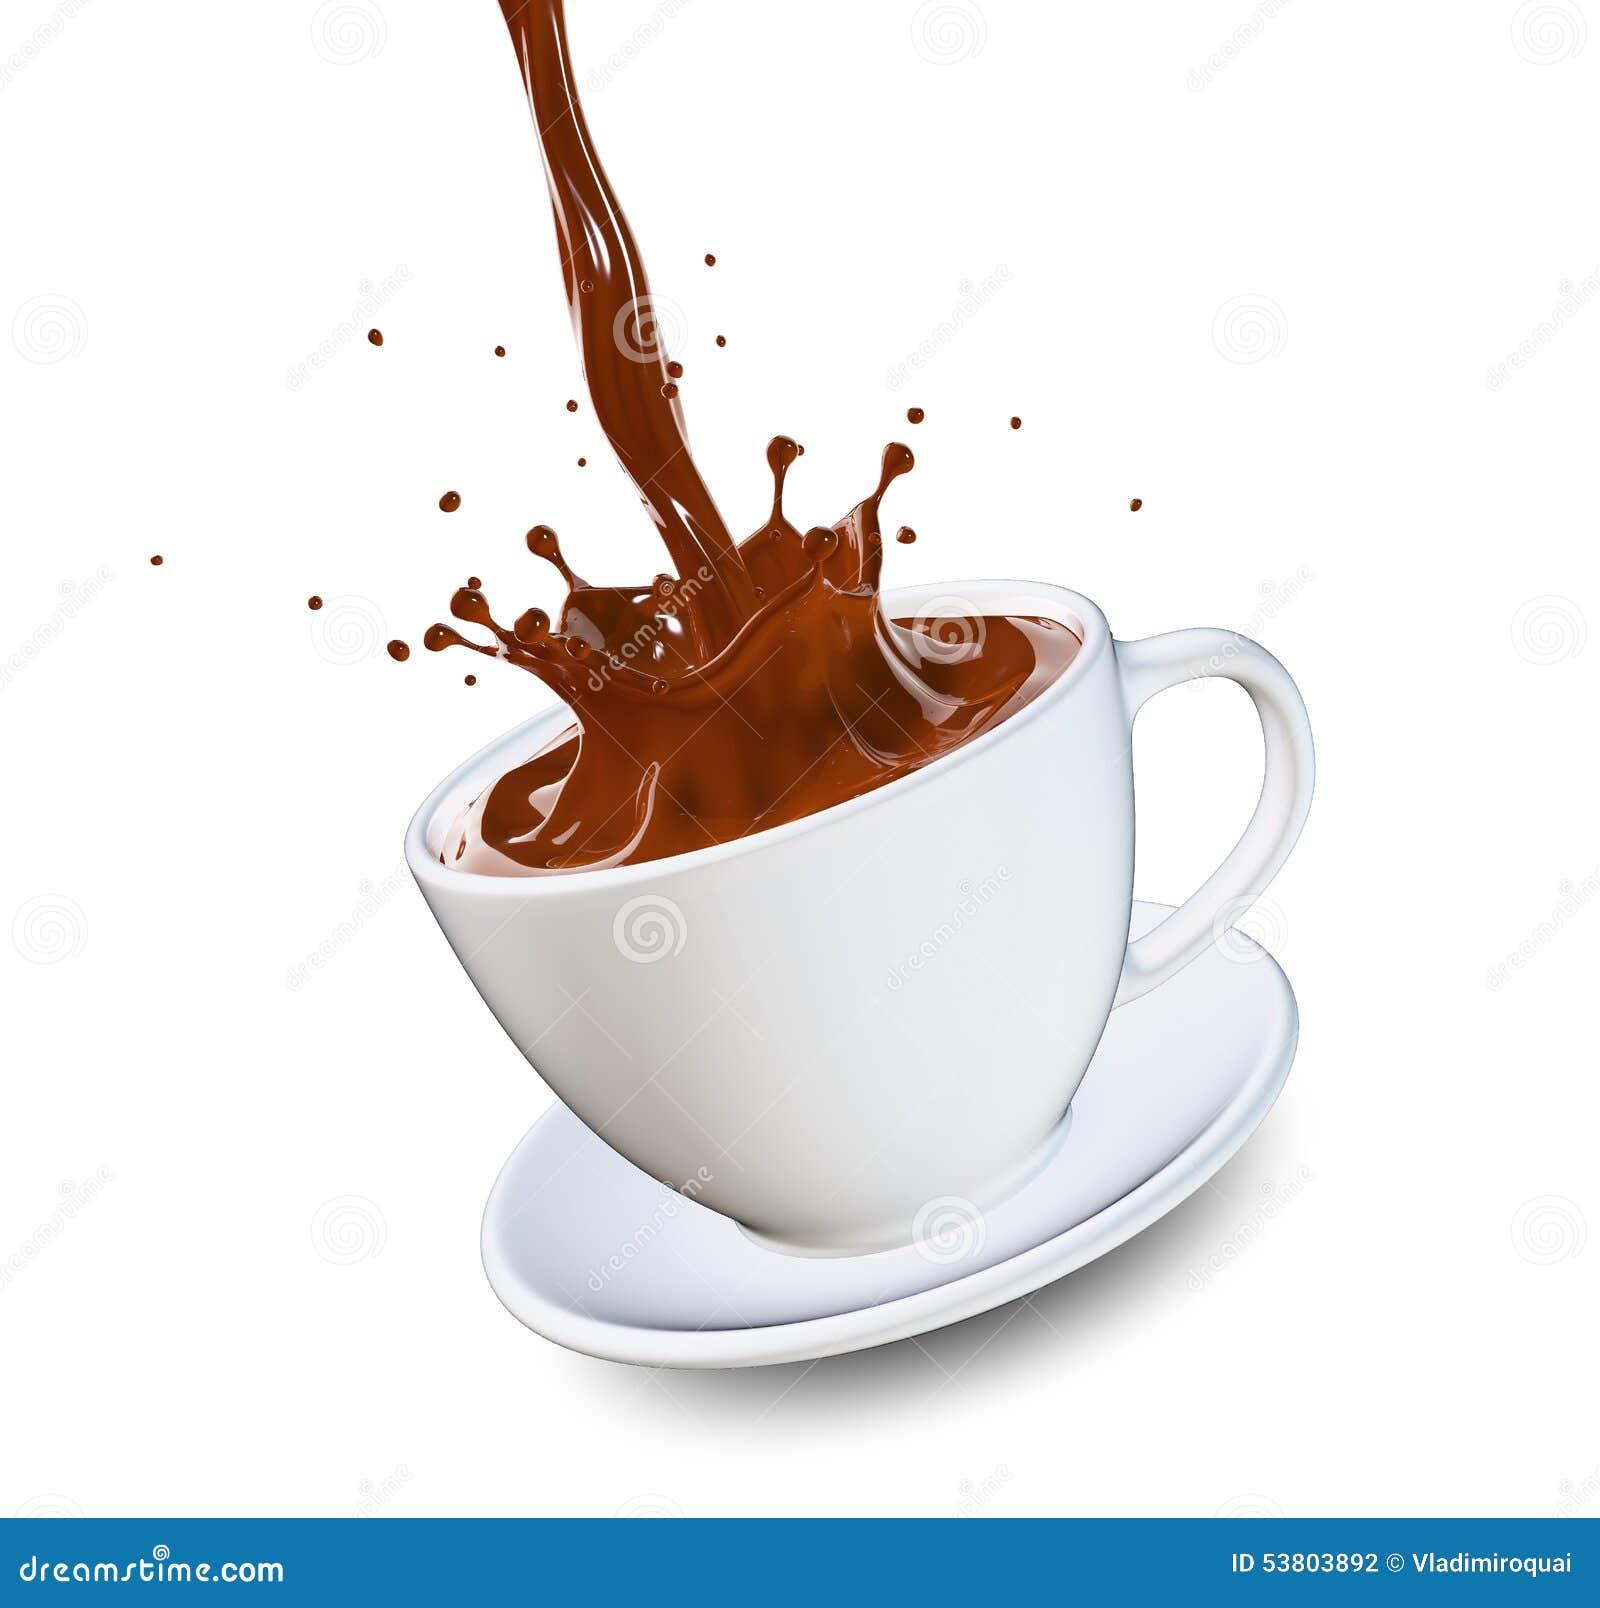 hot coffee white background - photo #42